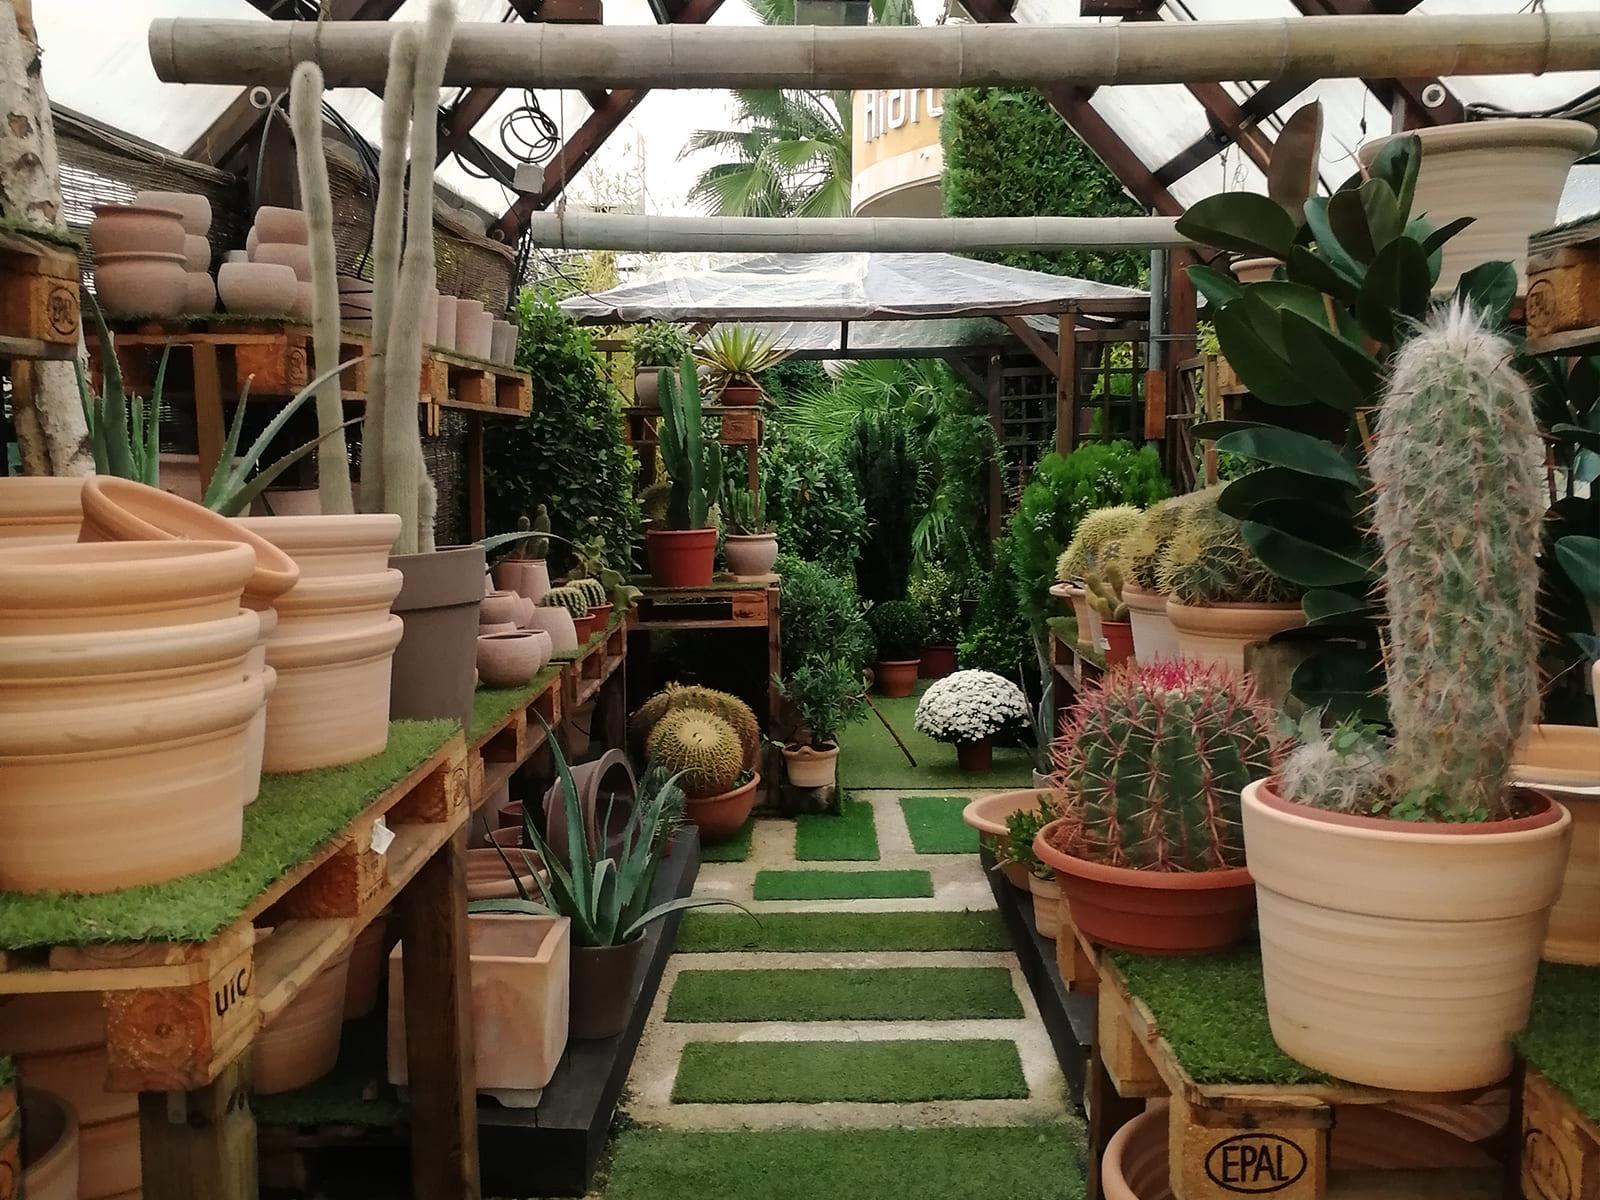 centro-jardineria-garden-invernadero-artesanal-madera-fuente-15_HIDROJARDIN-Bañeres